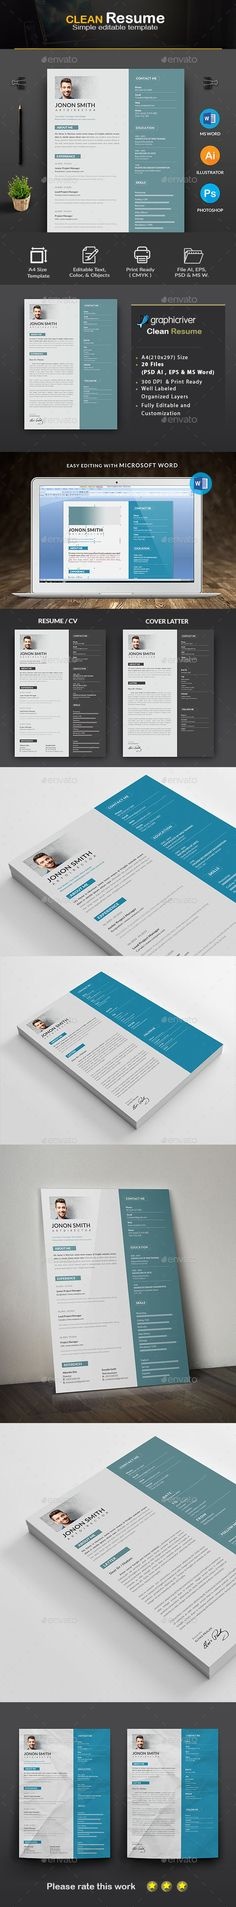 Resume Resume cv, Font logo and Adobe illustrator - resume paper size